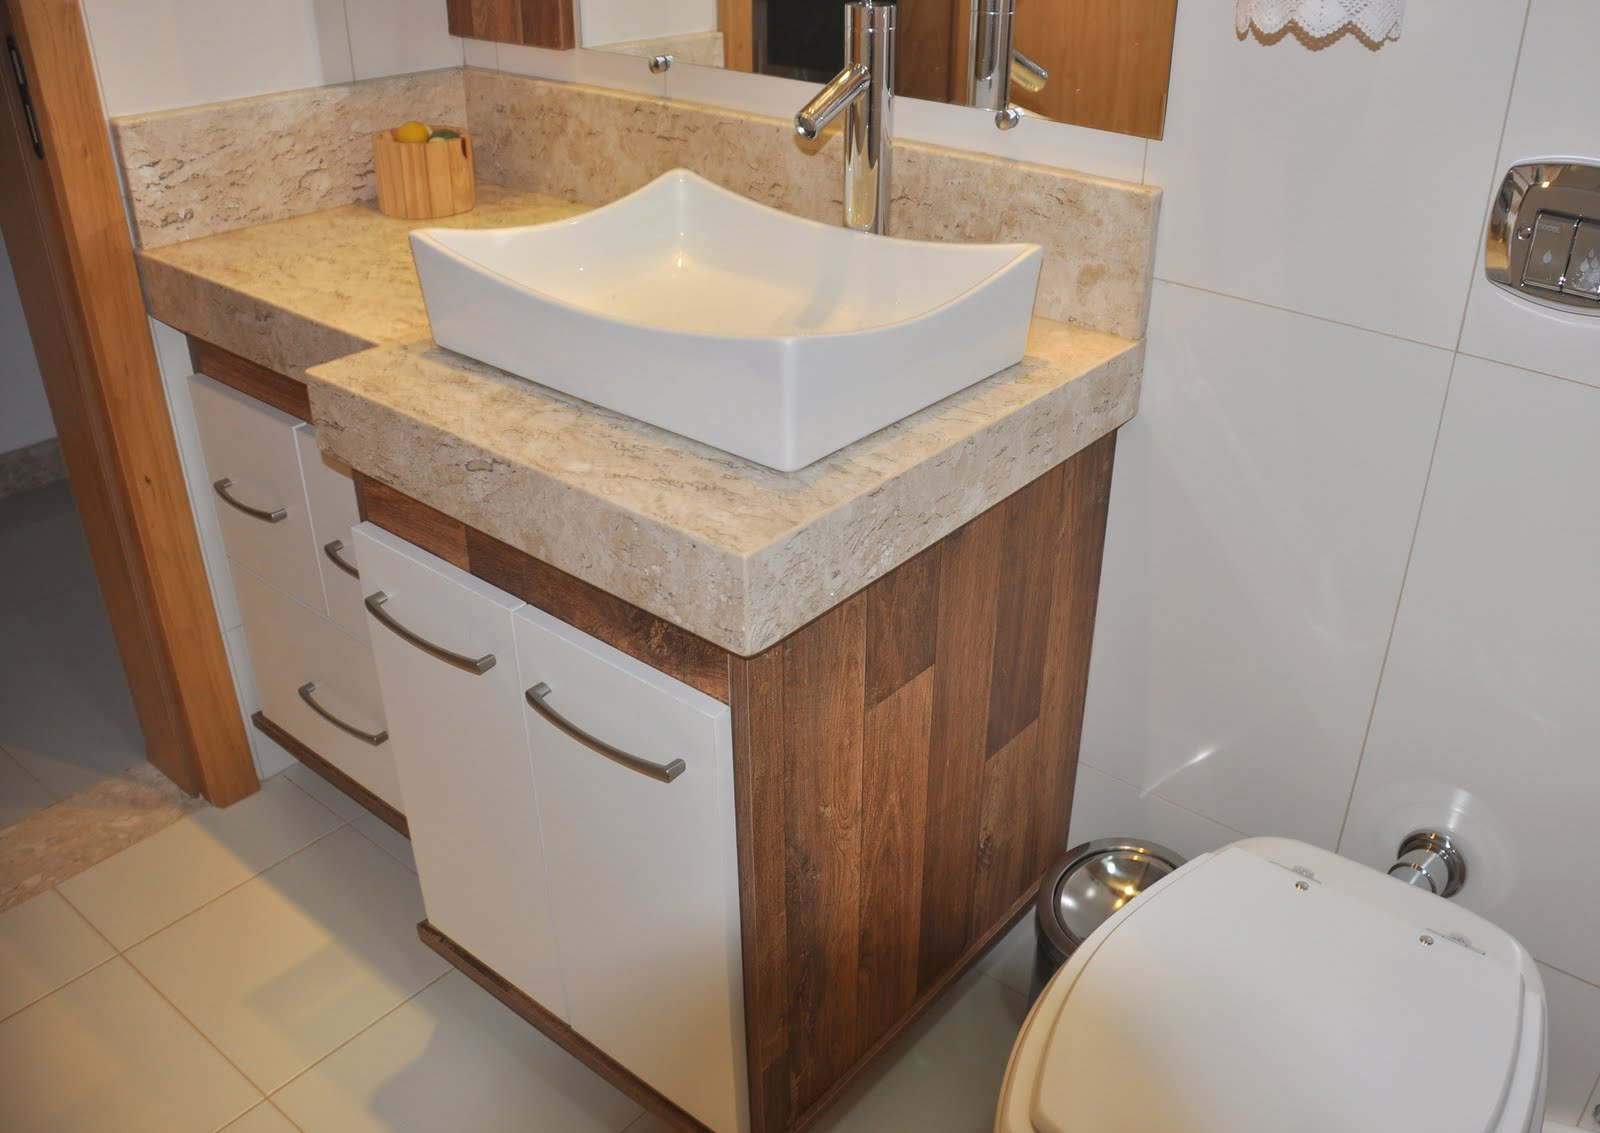 2011 04 10 Marmoraria MPK #956736 1600x1133 Banheiro Com Granito Travertino